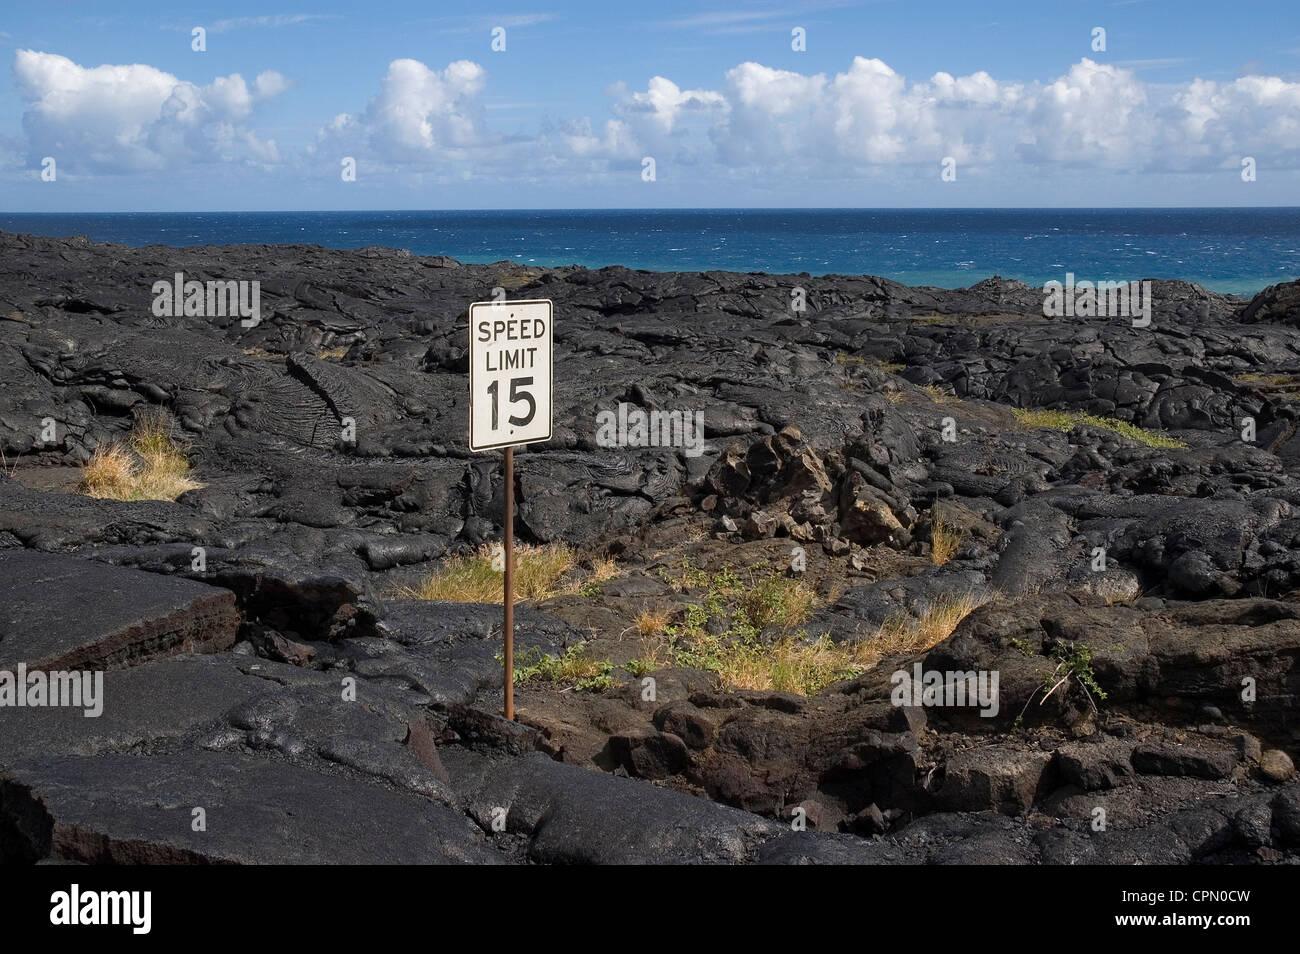 Elk284-2662 Hawaii, HI, Volcanoes NP, South Coast, road sign in lava flow - Stock Image